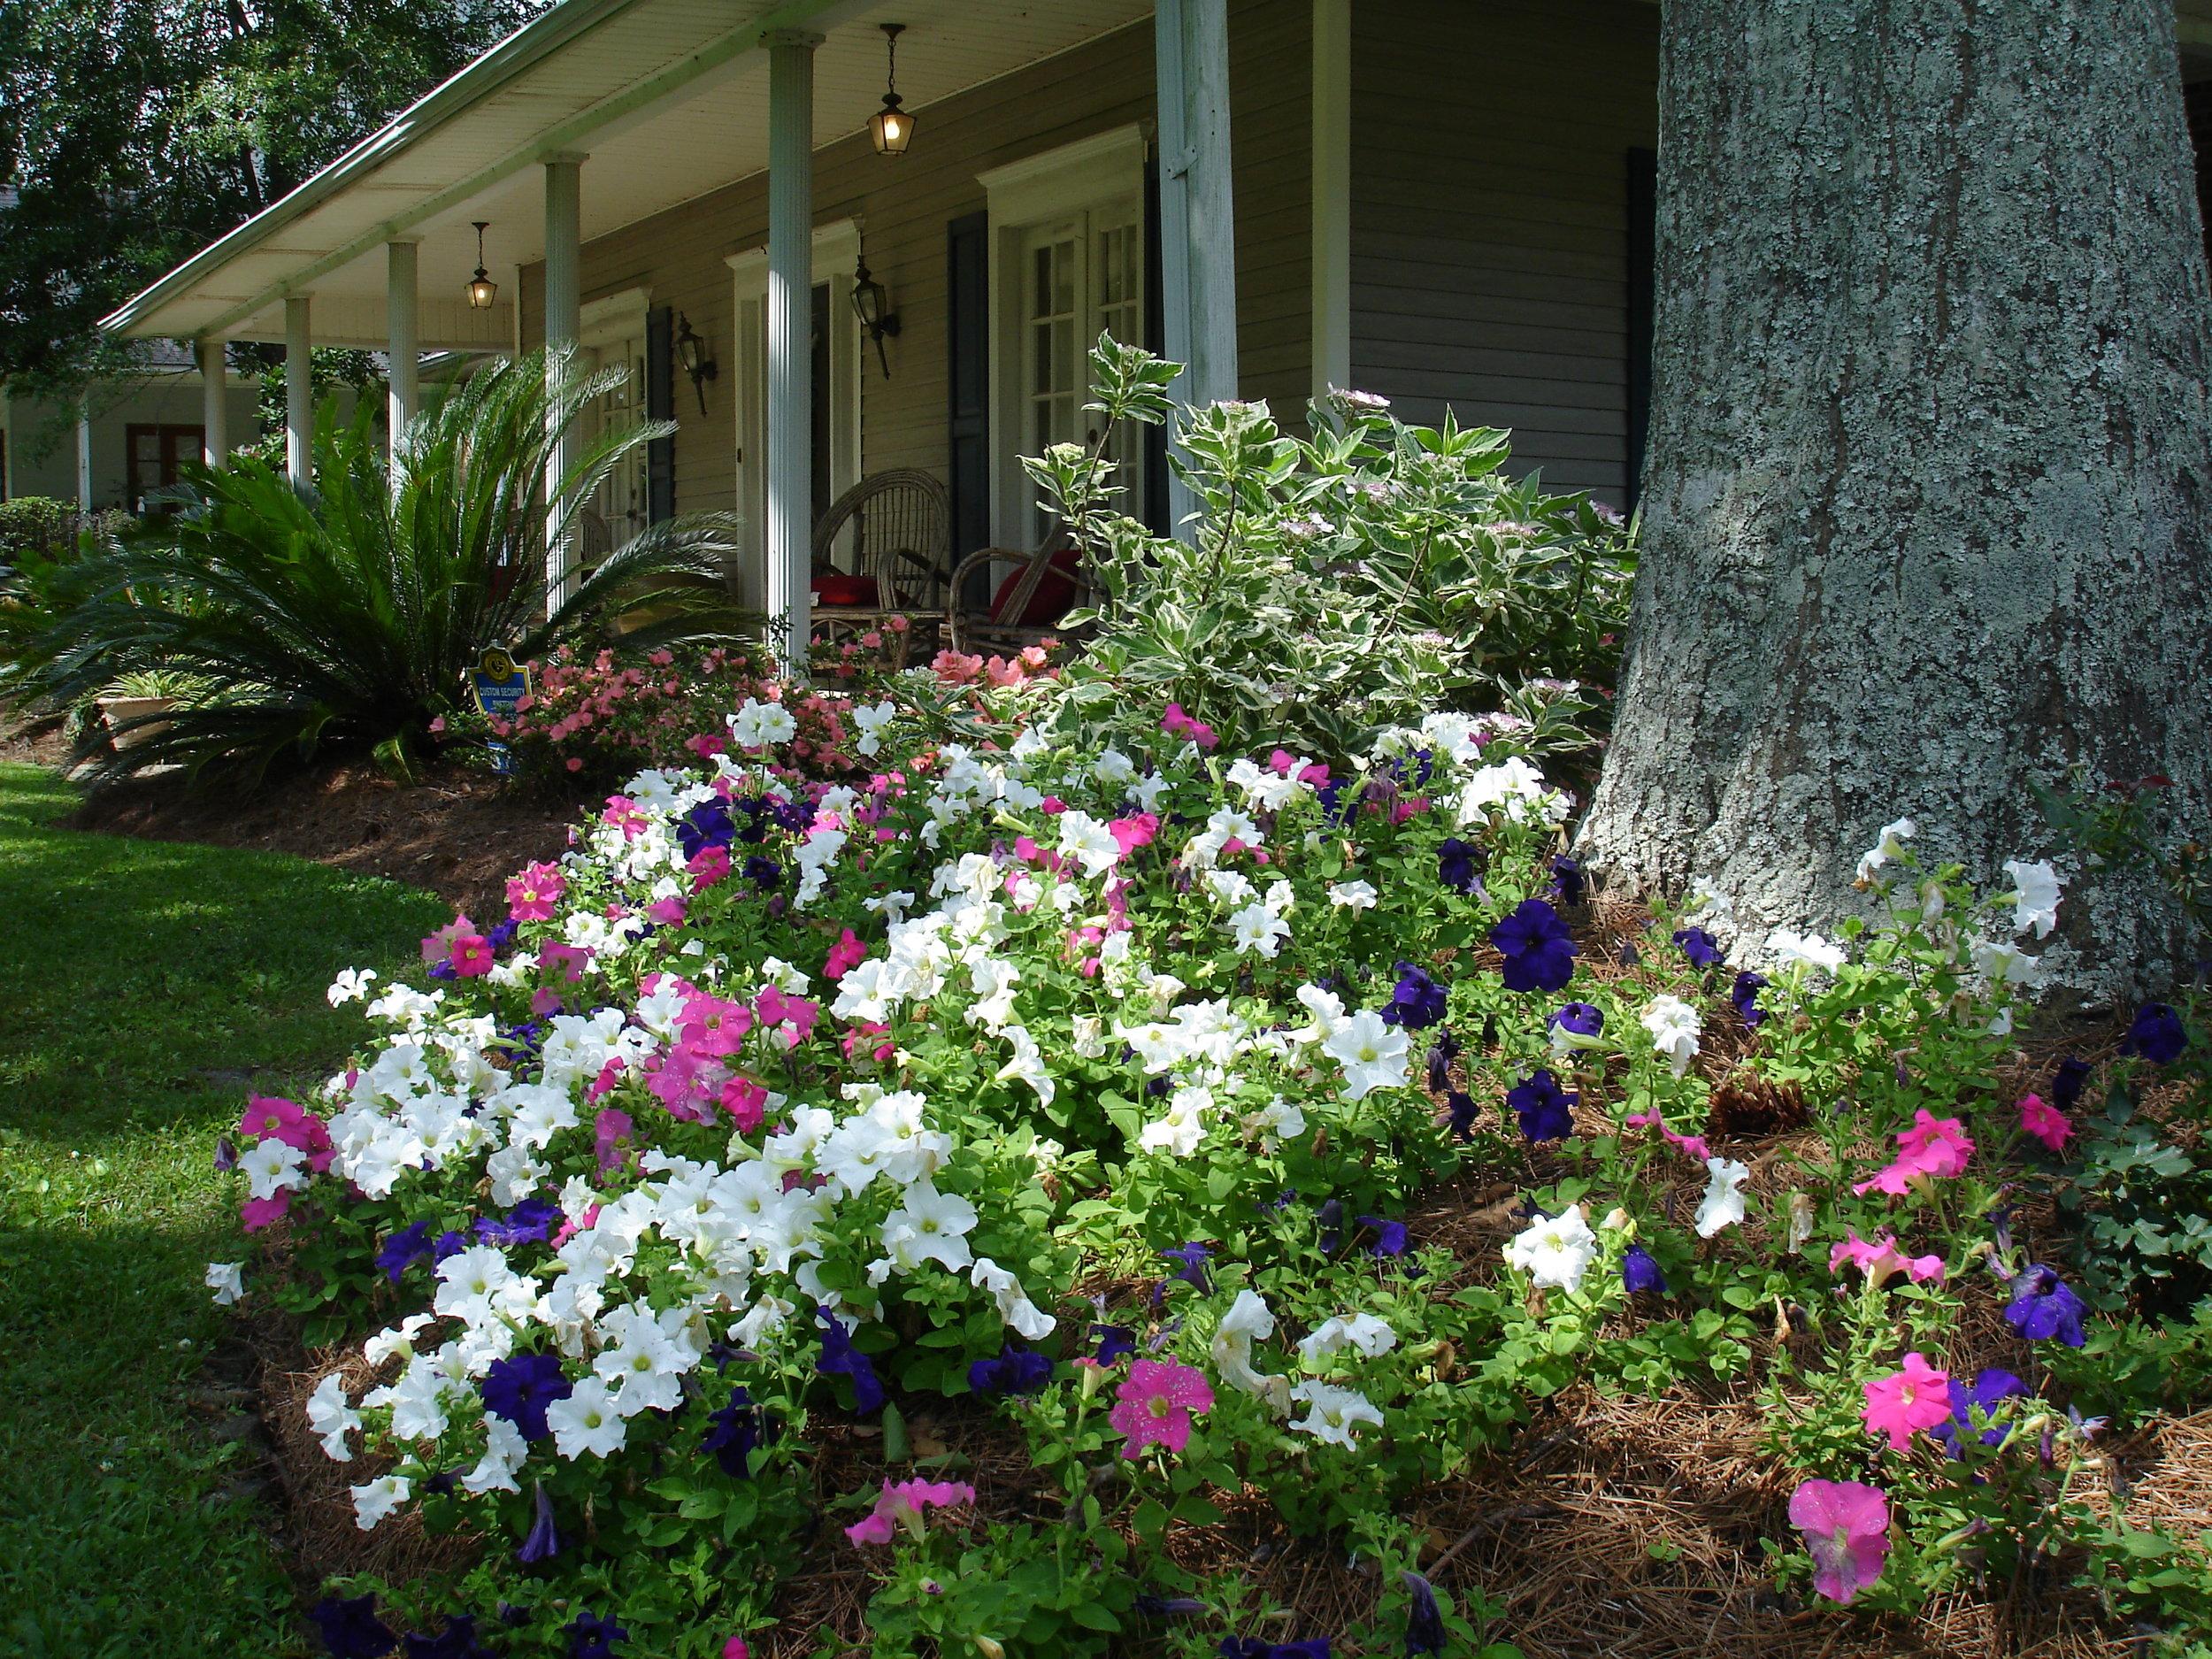 flowerbed-maintenance-seasonal-color-baton-rouge-area (7).JPG